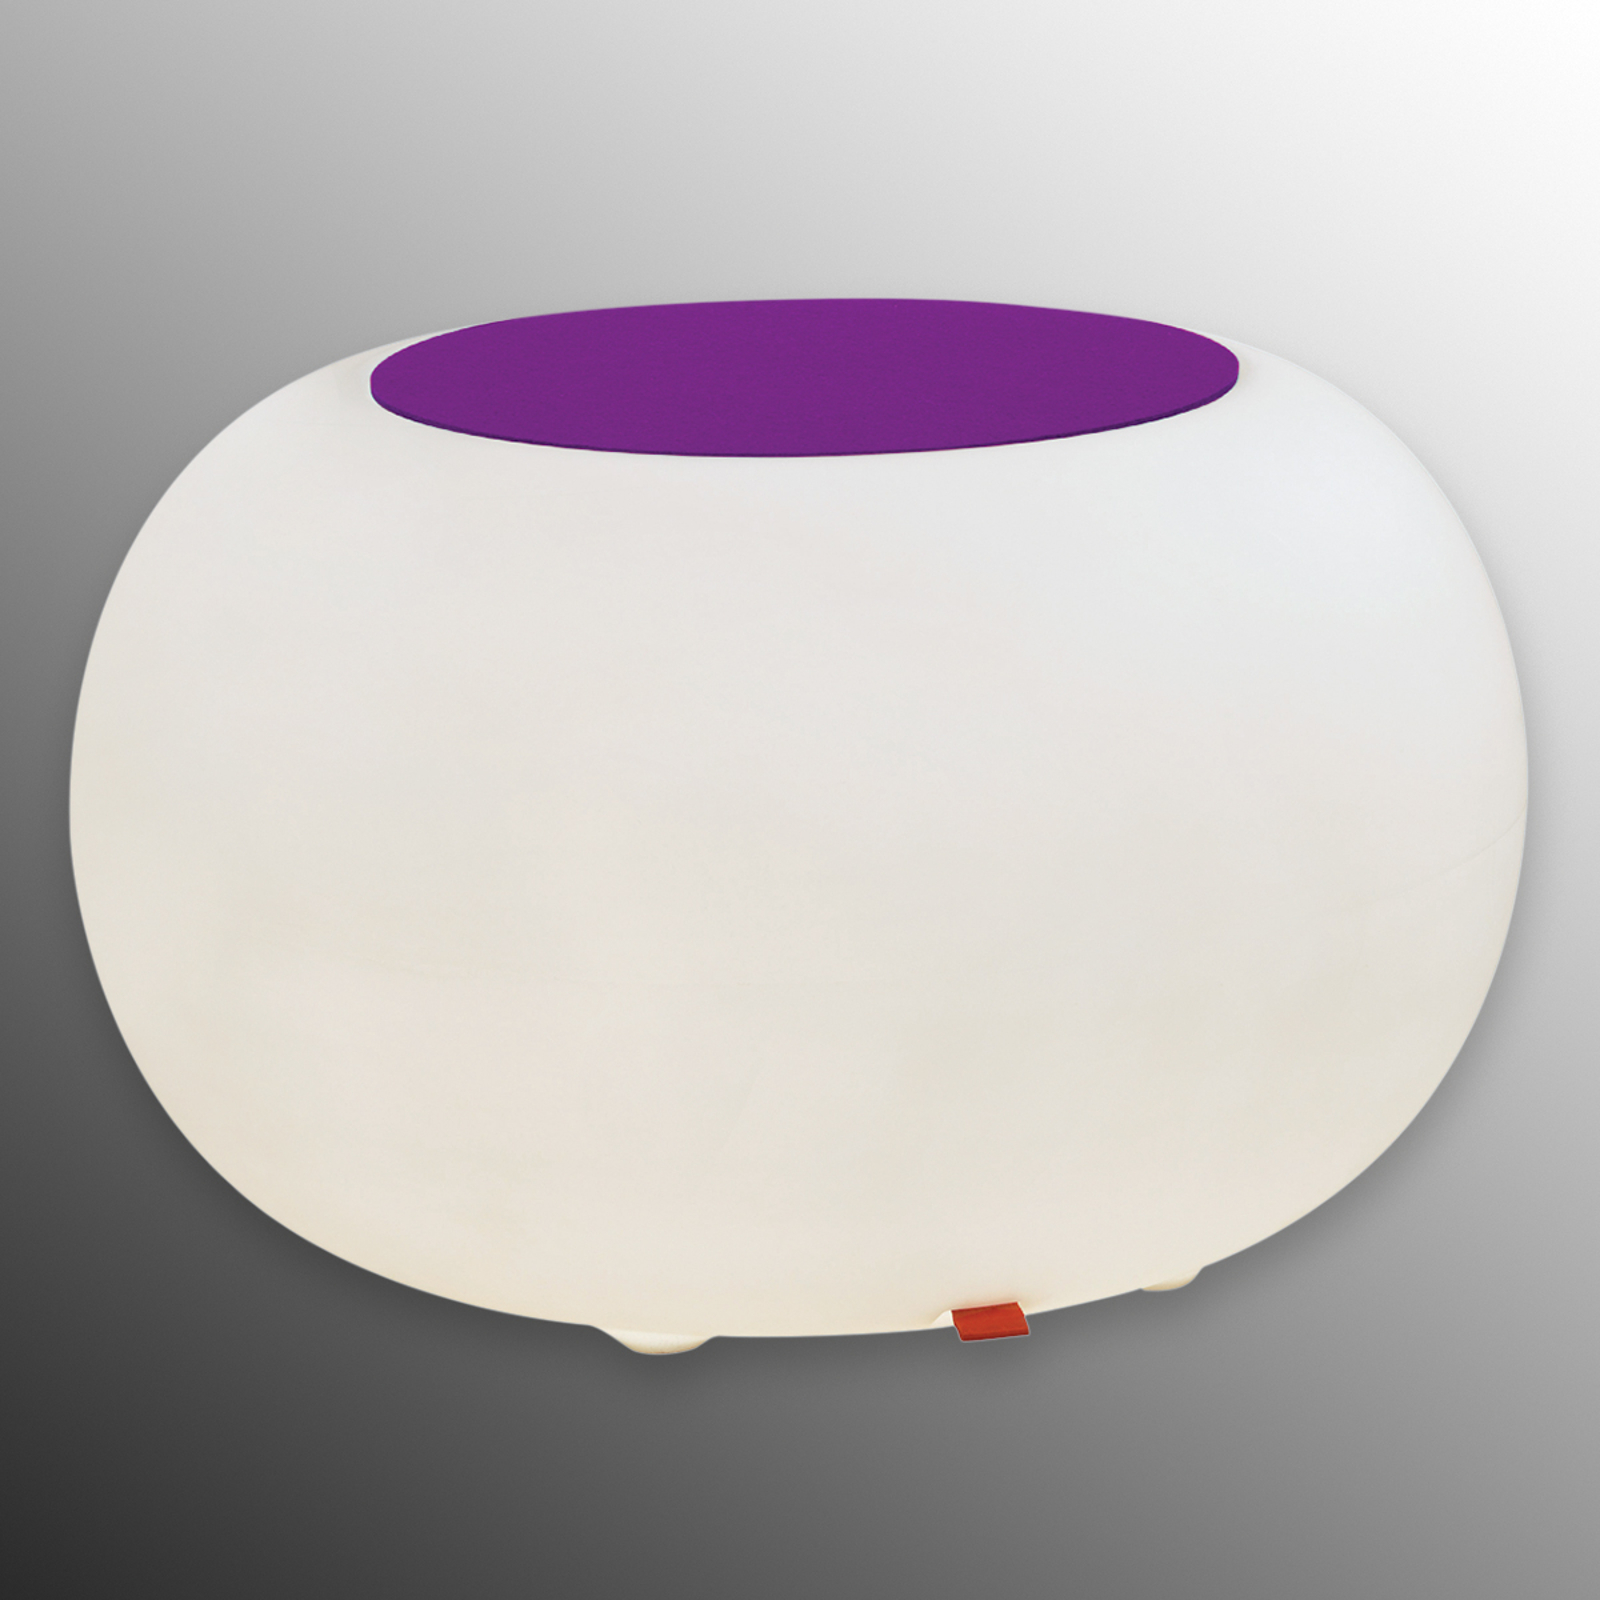 Bord BUBBLE Indoor LED RGB + fiolett filt